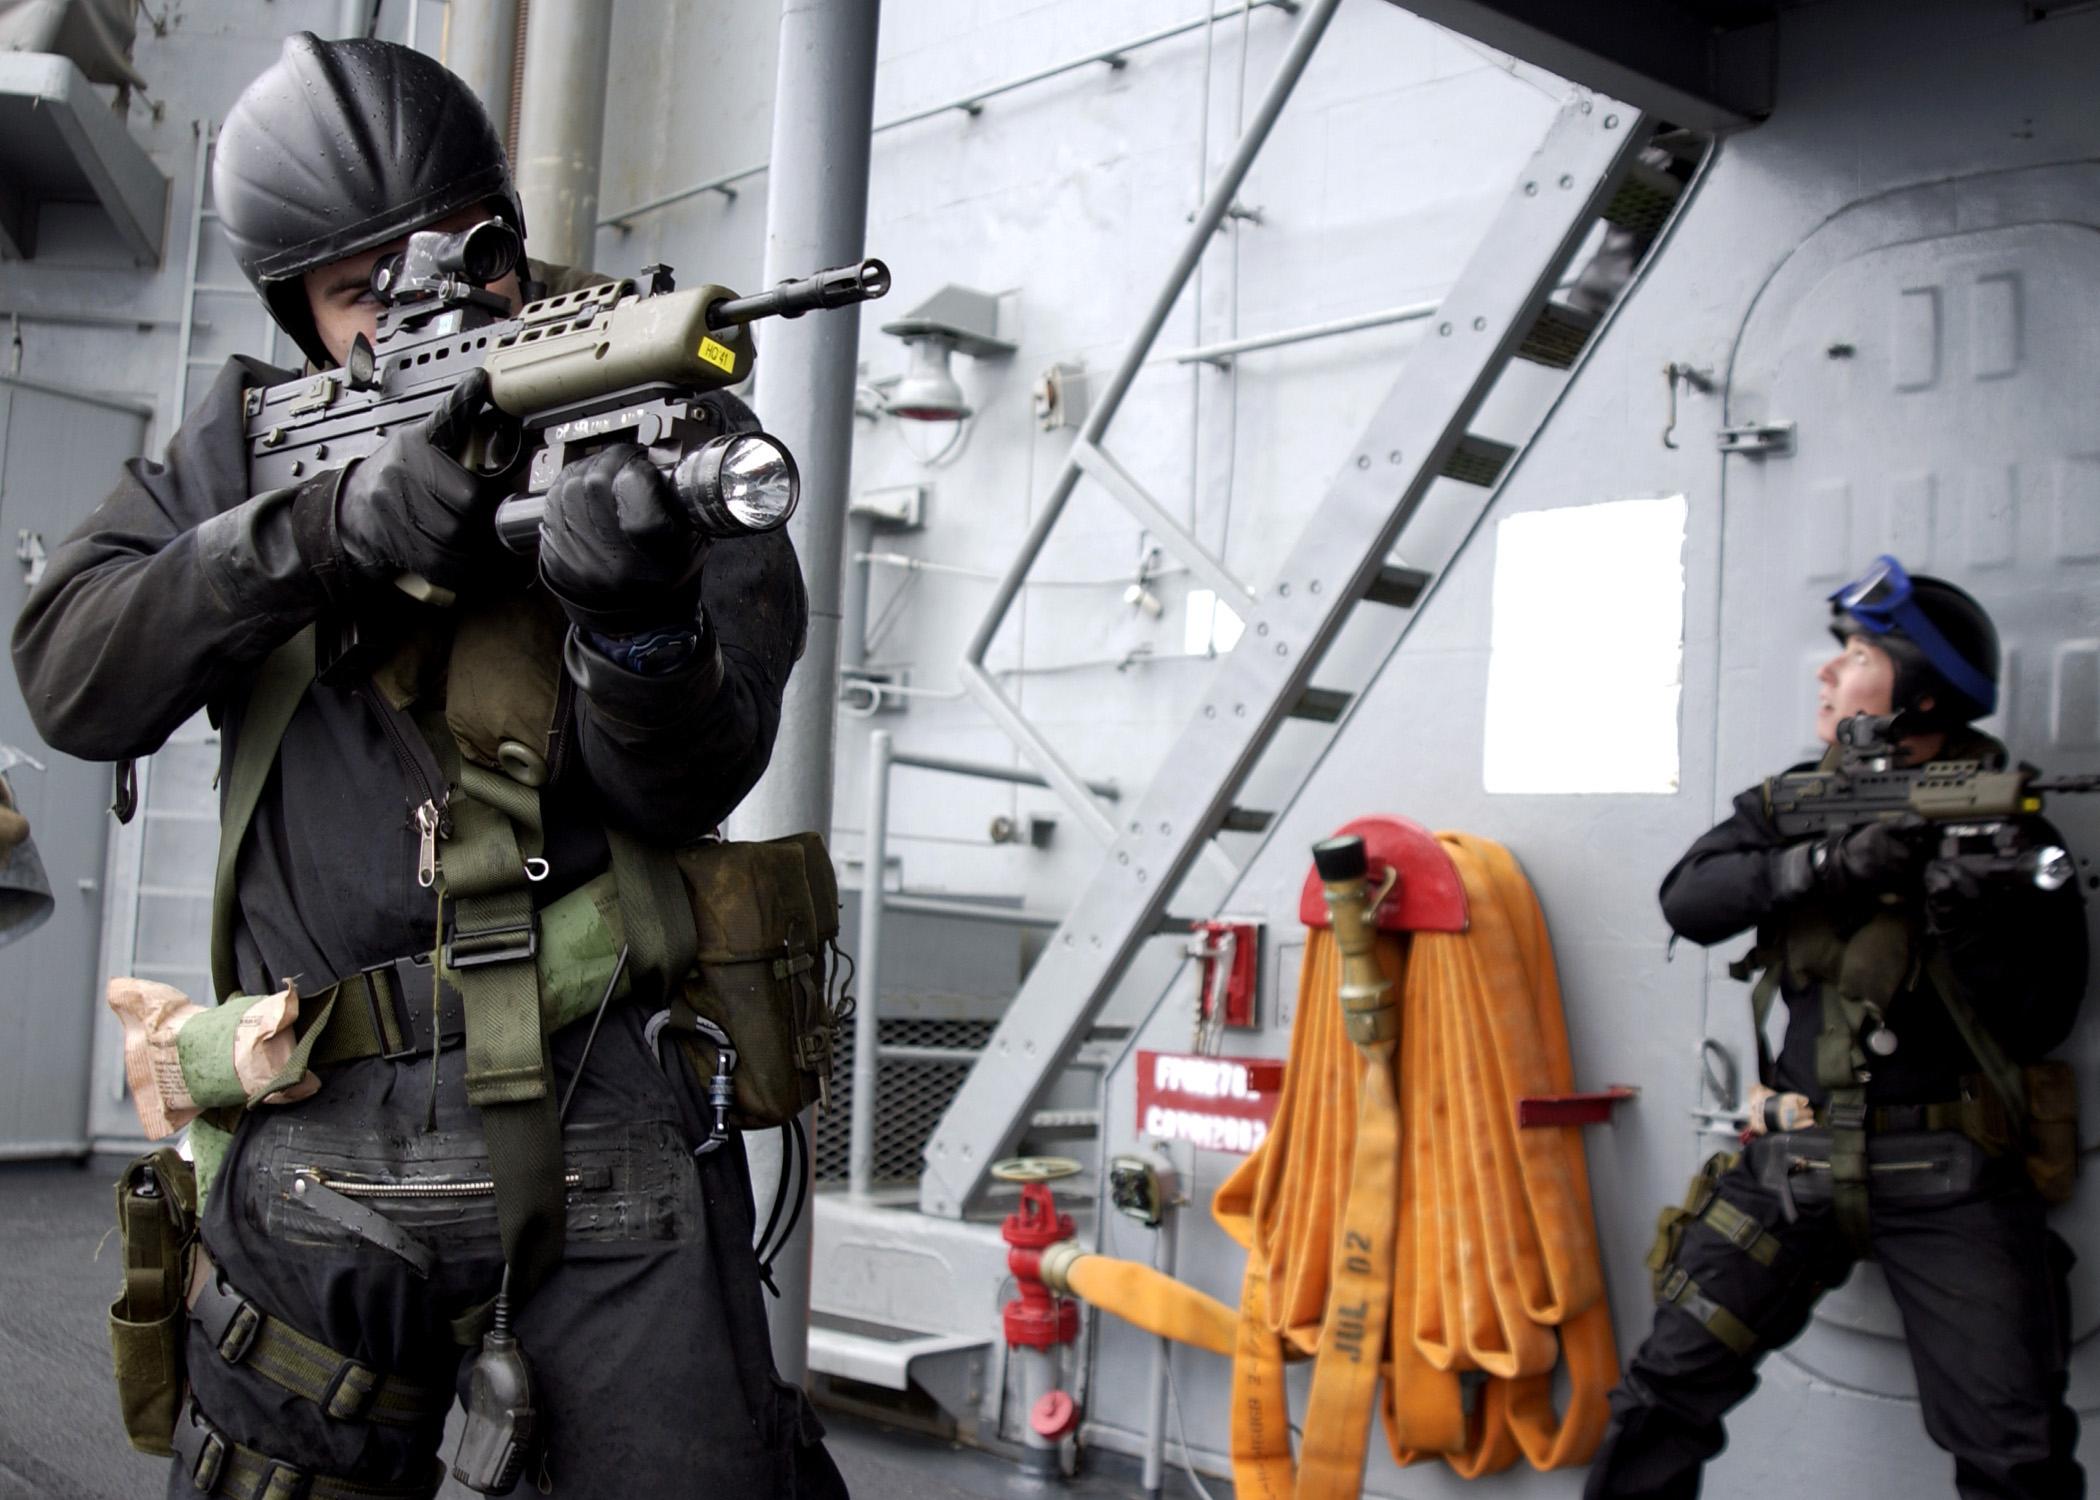 Fileus Navy 030618 N 9251b 044 A Uk Royal Marines Team Embarked